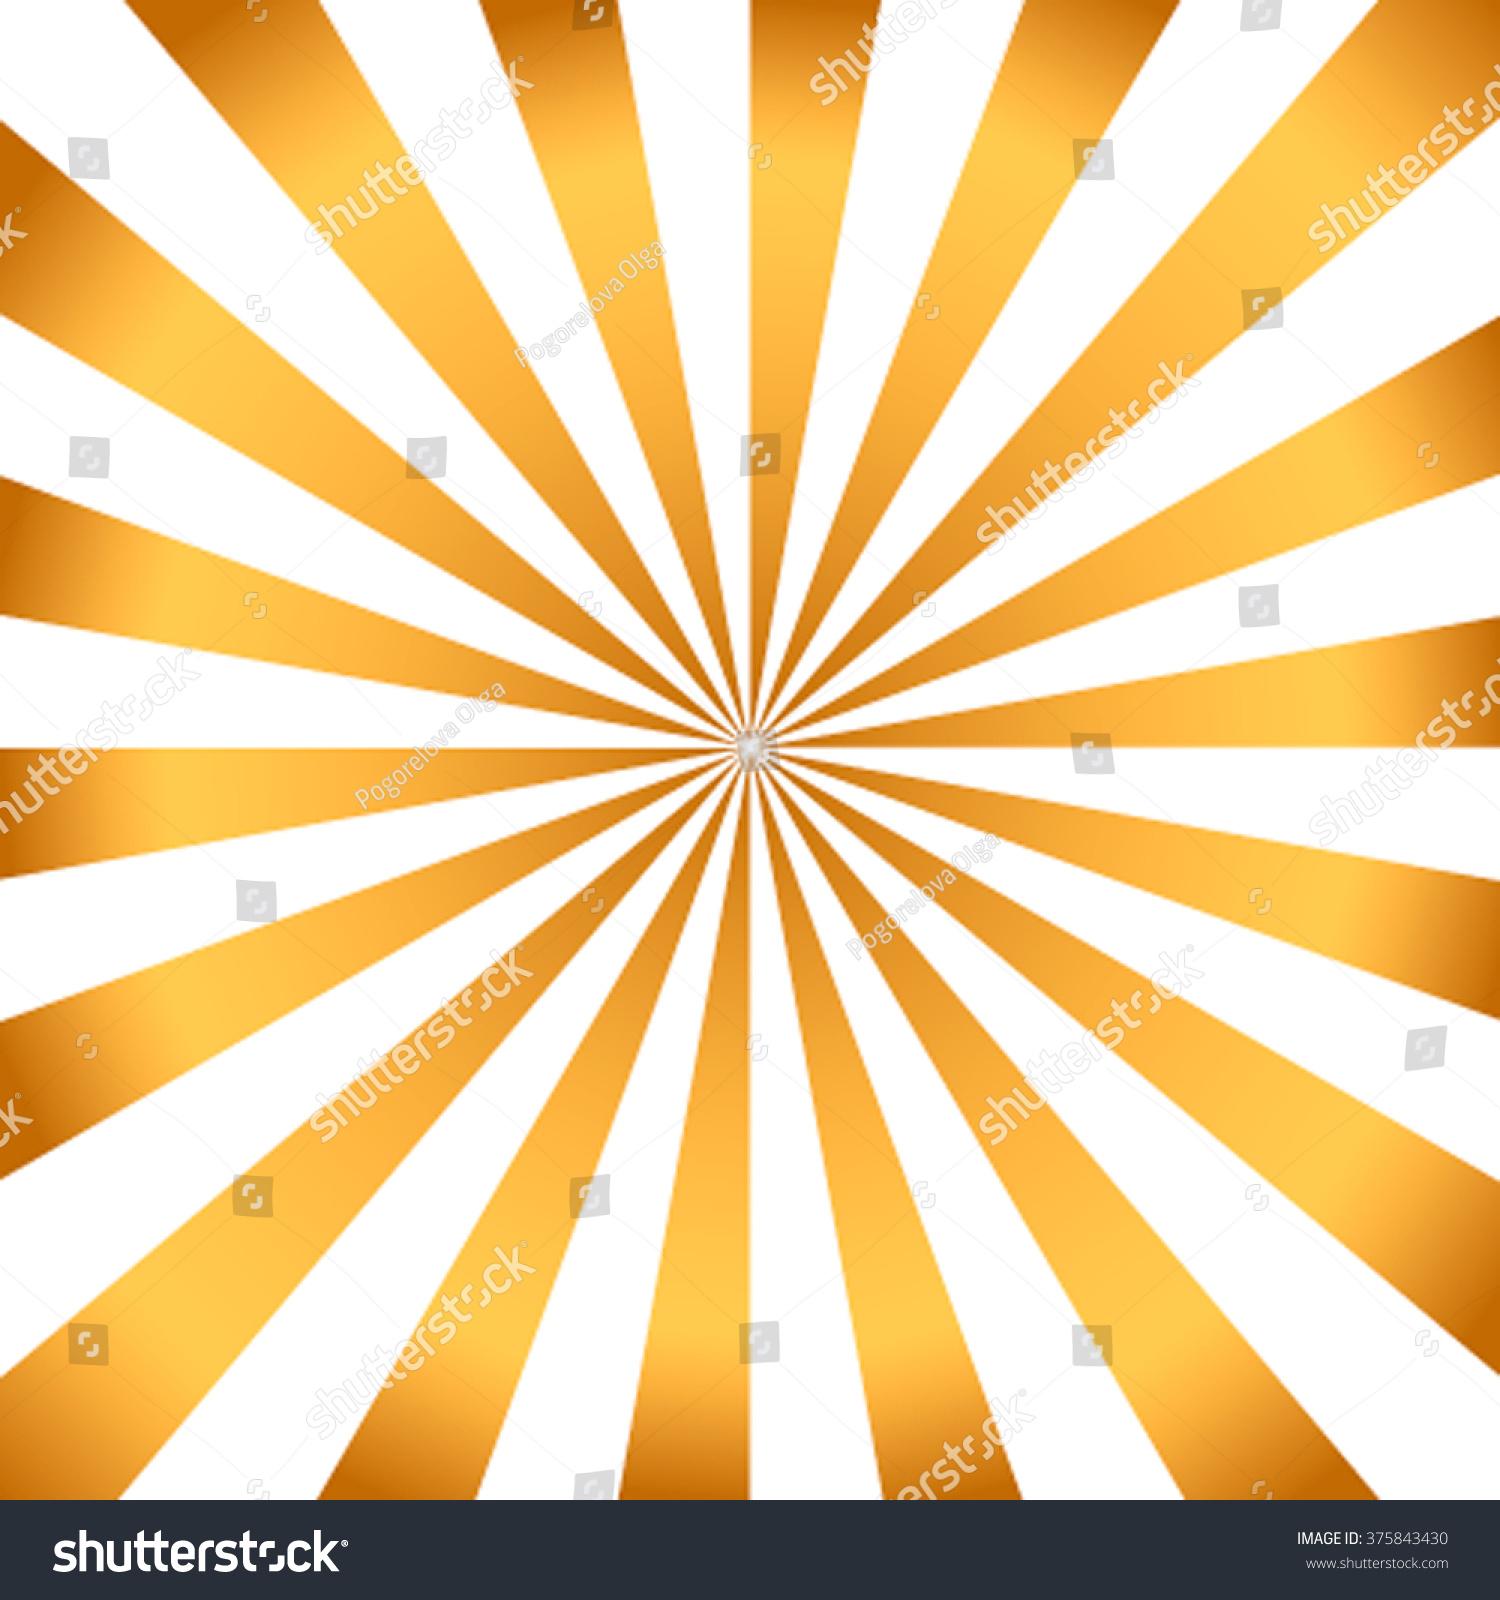 white golden rays vector carnival background stock vector (royalty